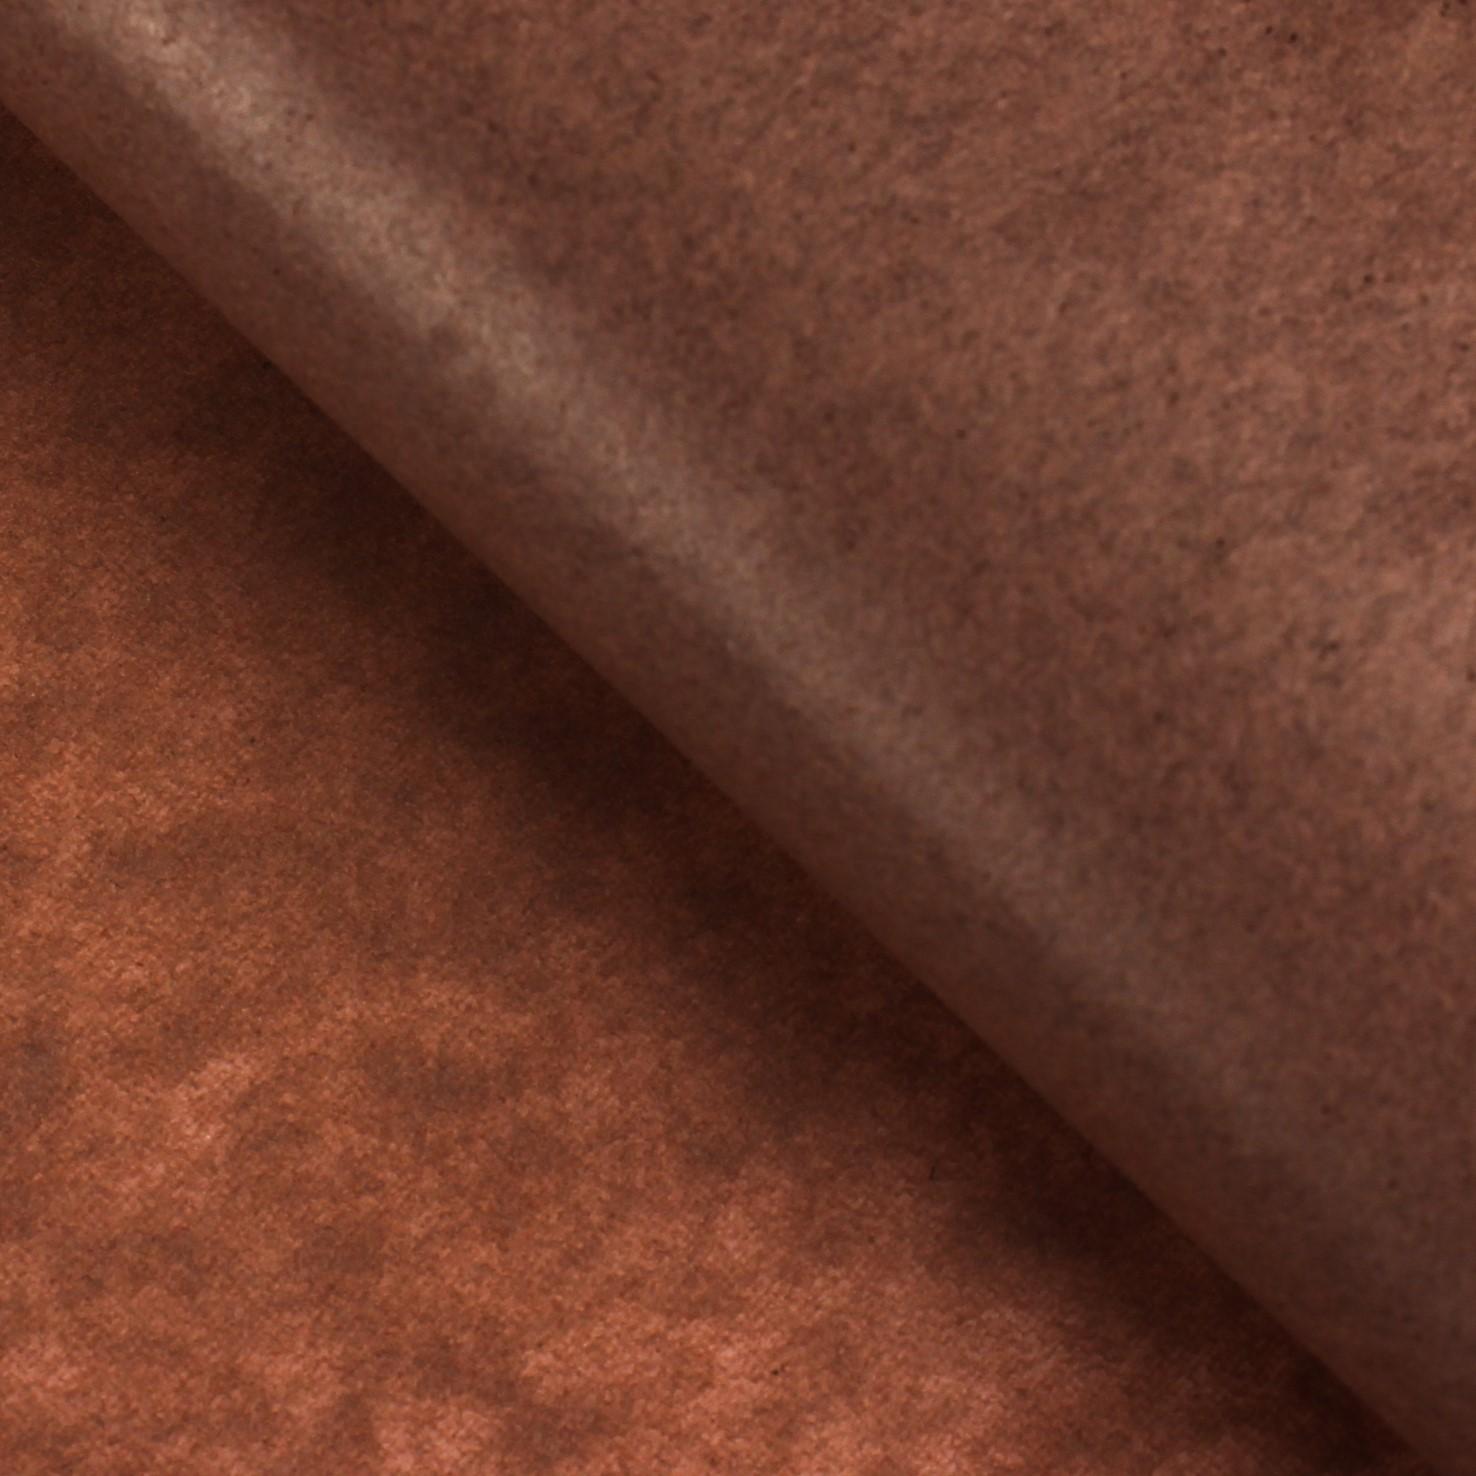 Бумага тишью, 75х50 см, 18 г/м2, цвет коричневый